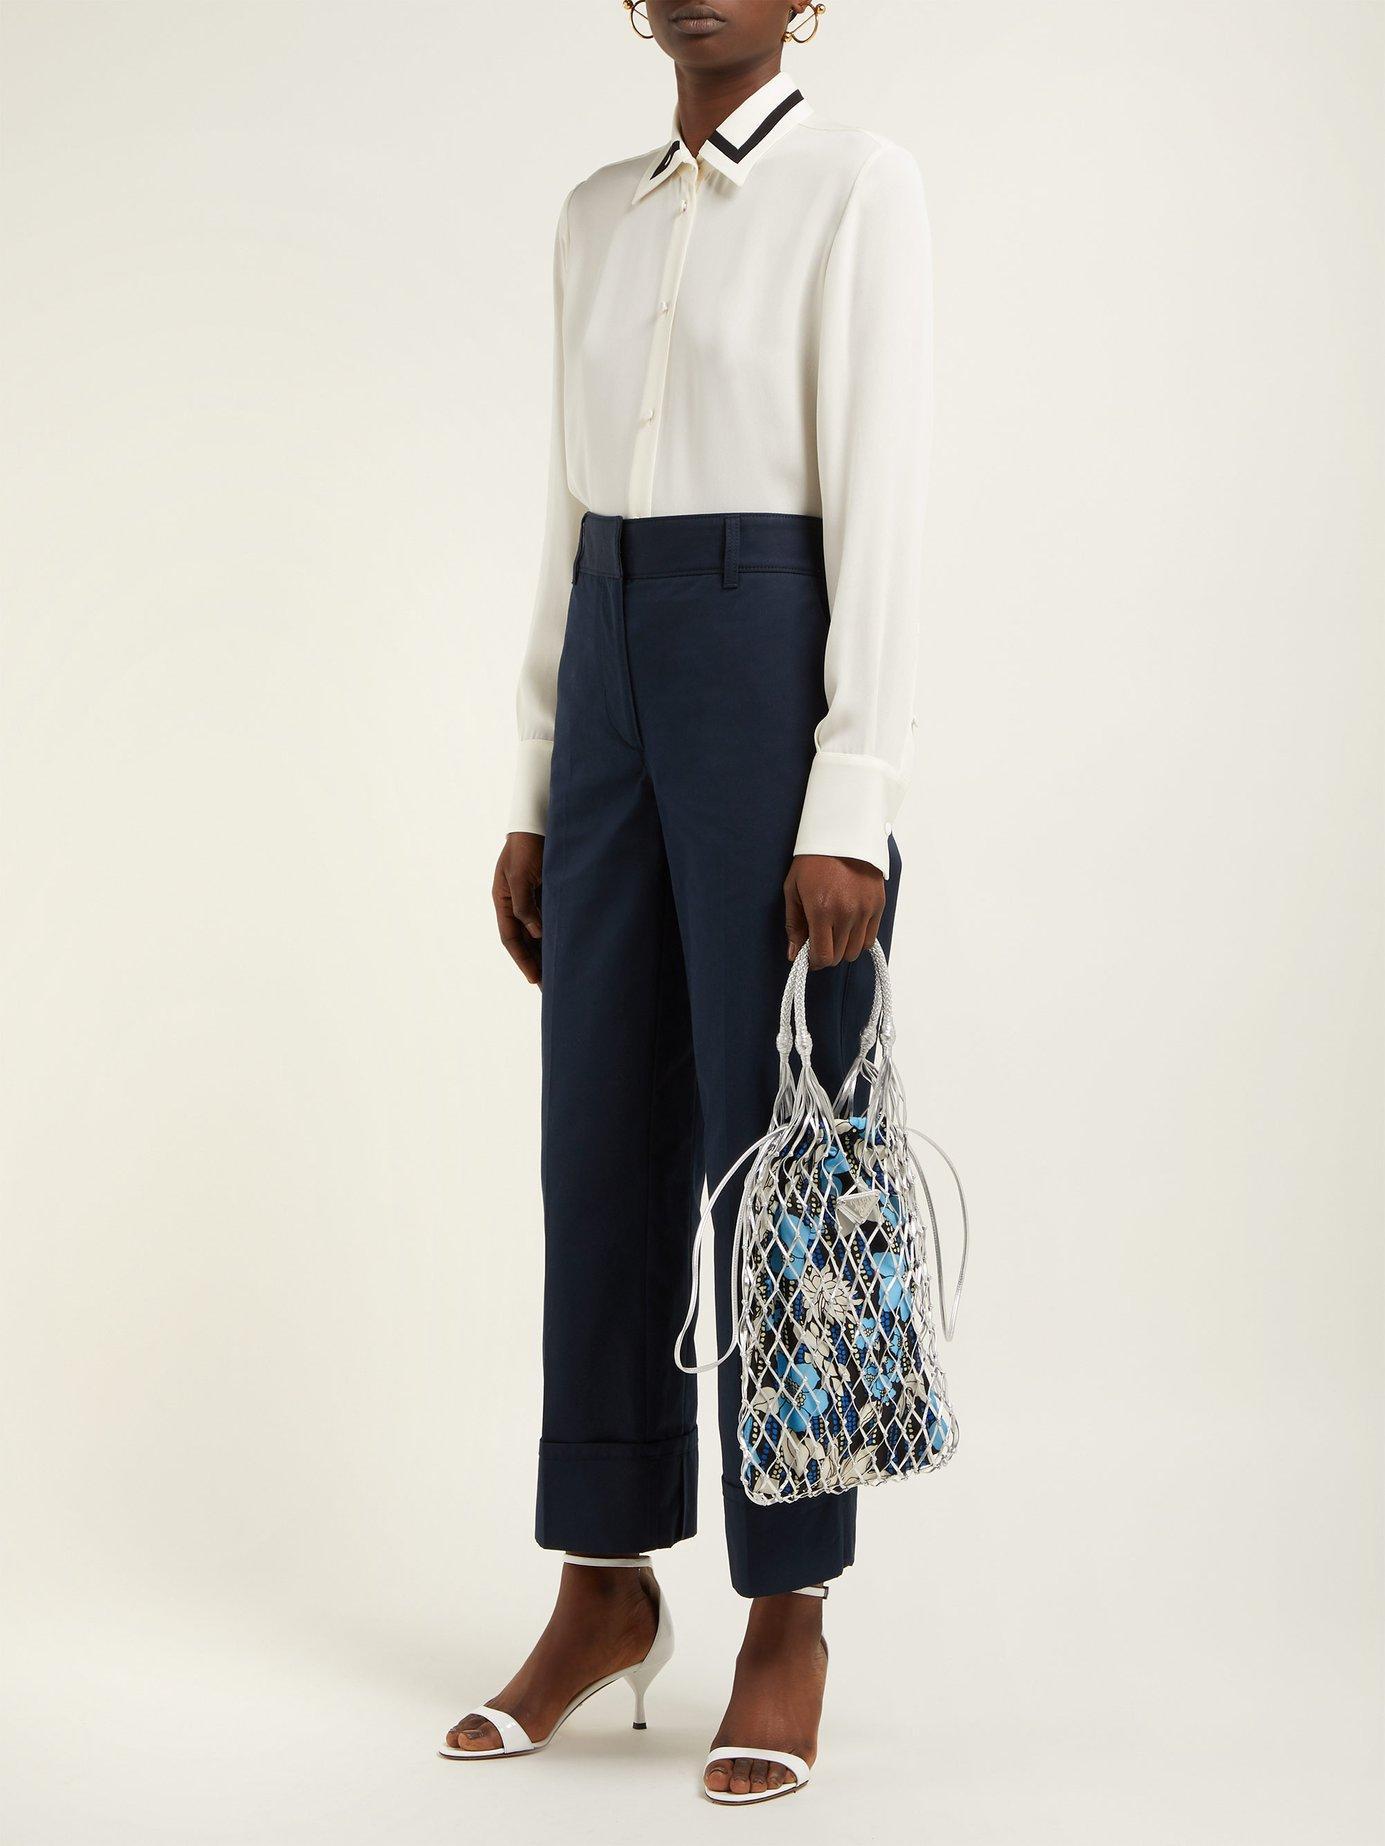 Prada - Blue Netted Leather Floral Print Bag - Lyst. View fullscreen 30703bedec